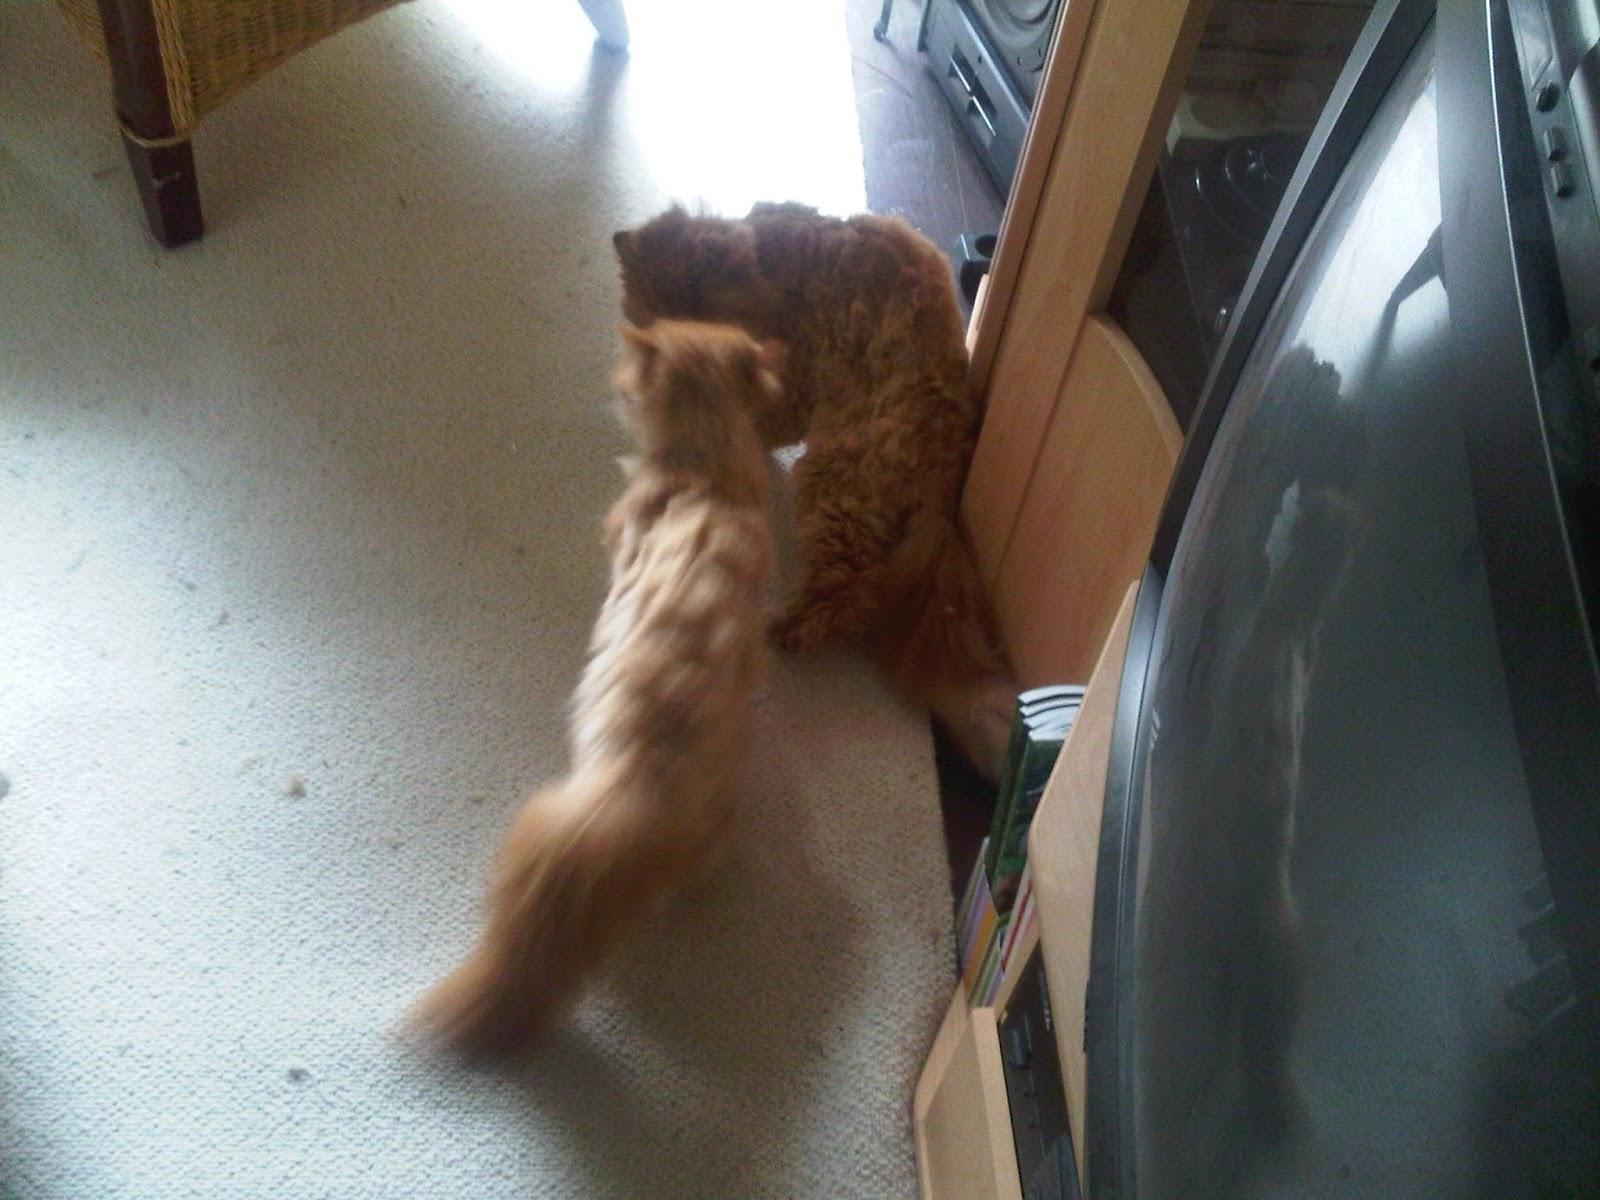 Katze attackiert Kater.